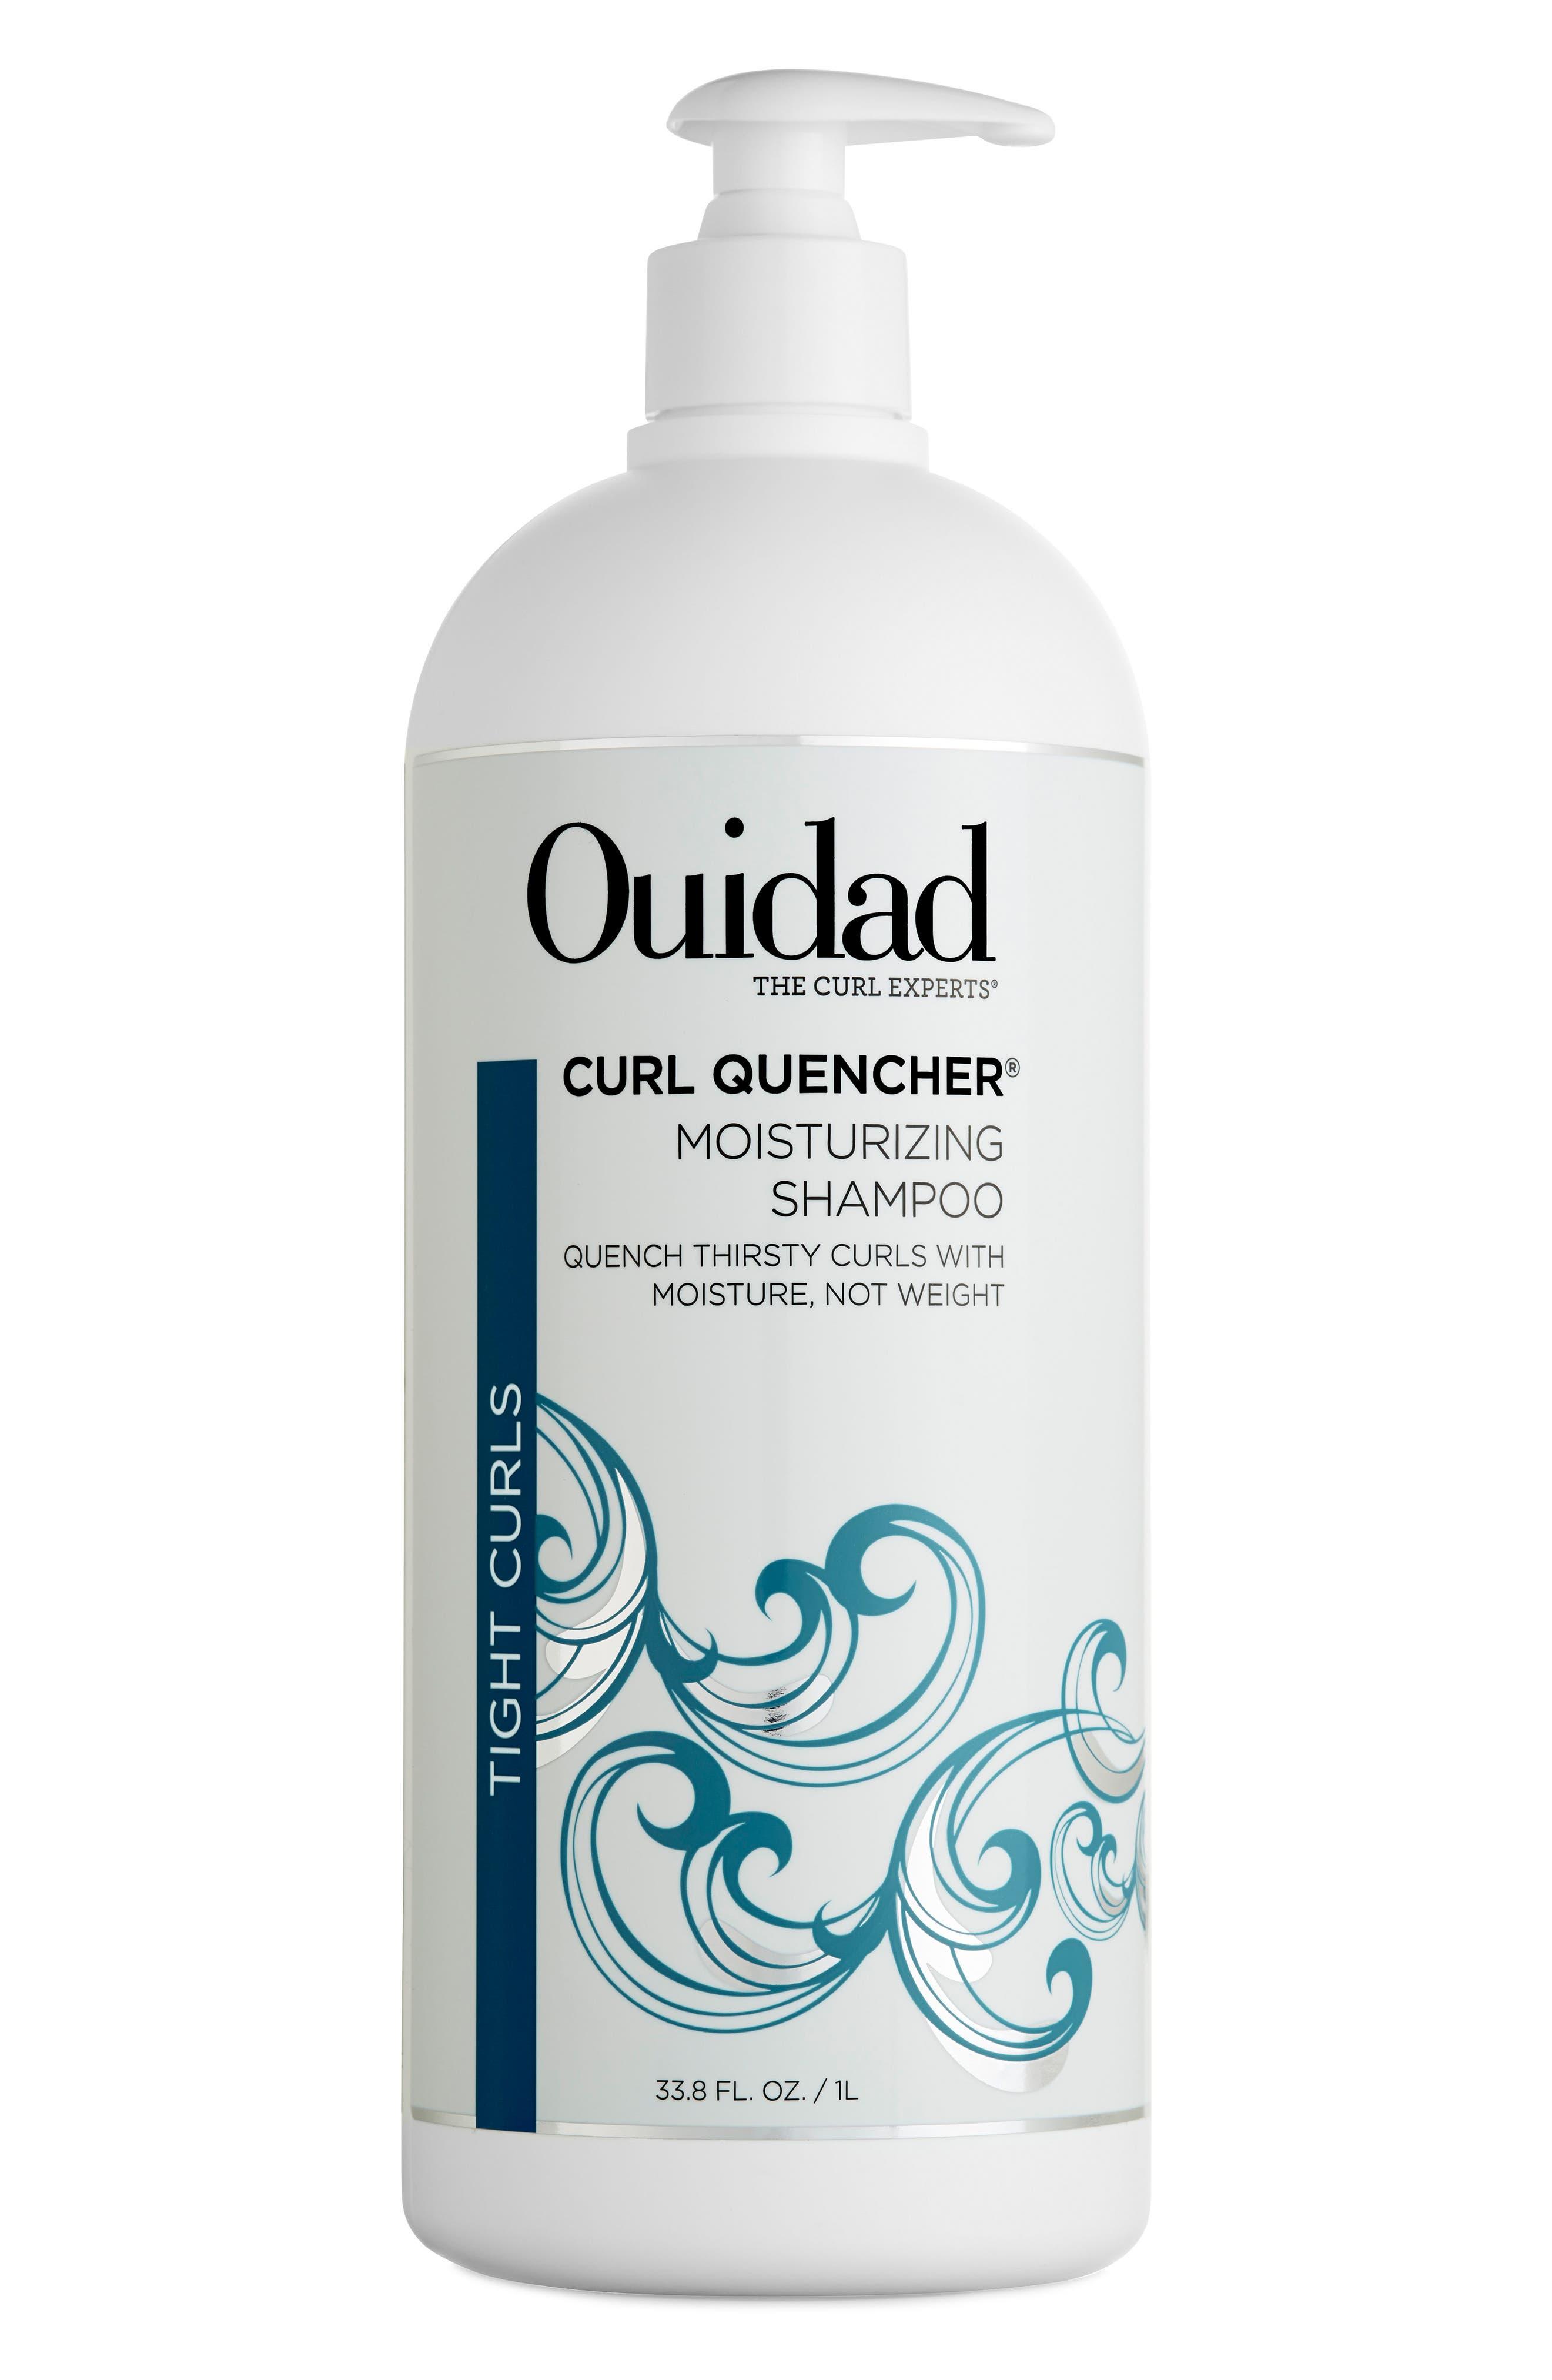 Ouidad Curl Quencher® Moisturizing Shampoo